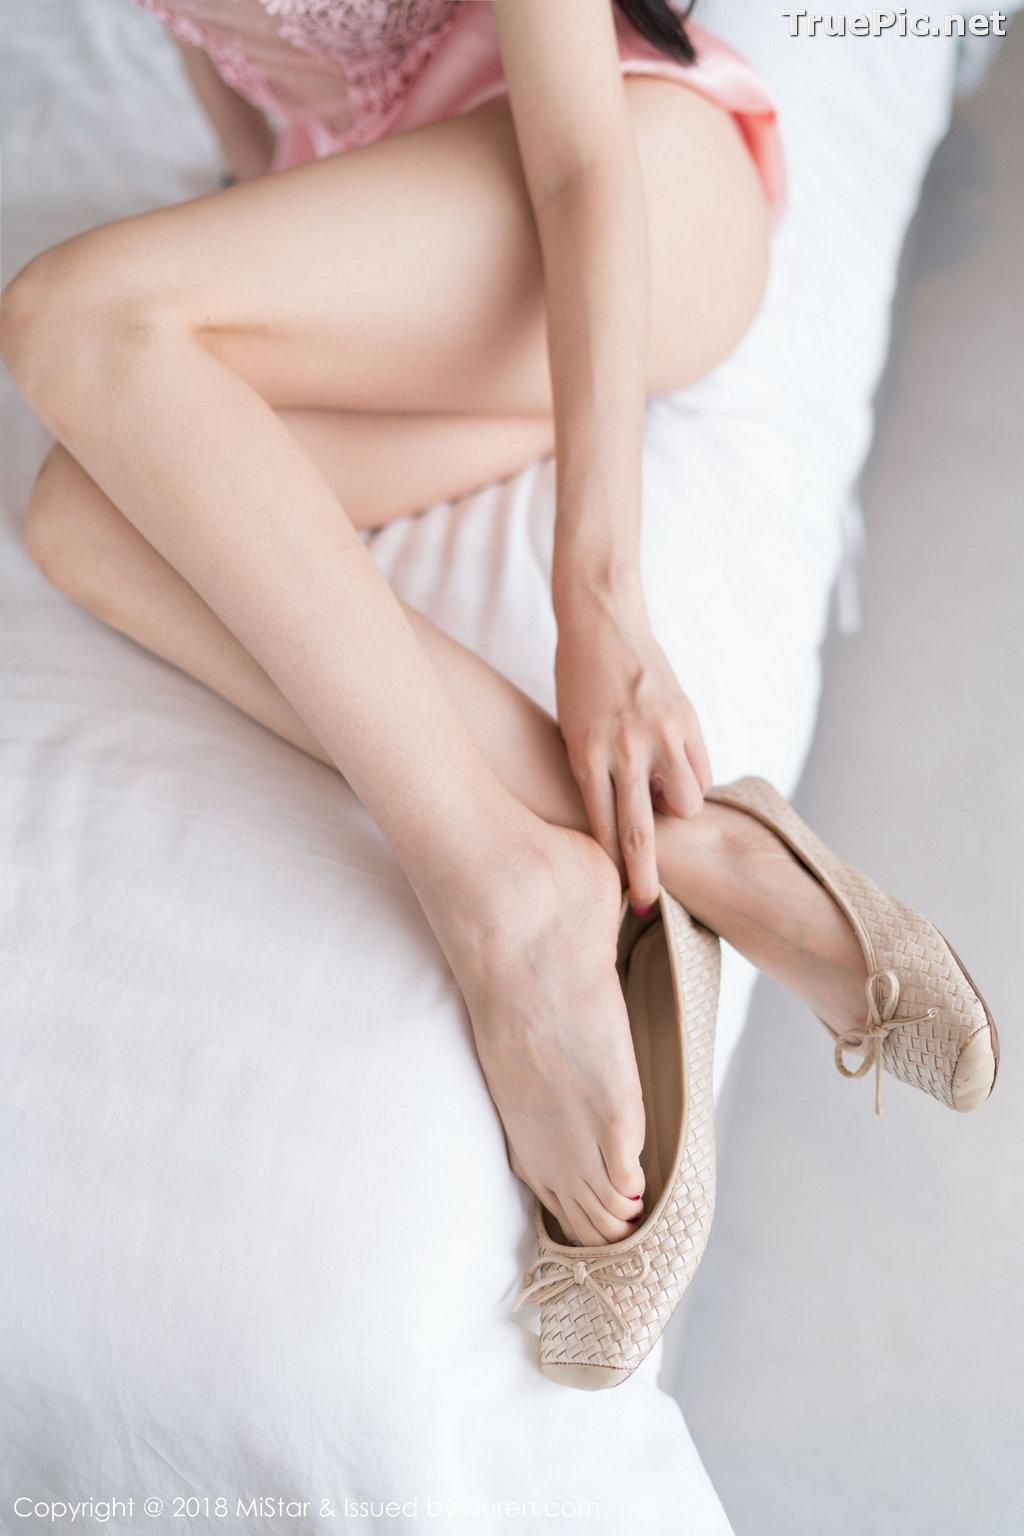 Image MiStar Vol.238 - Chinese Model - Xiao Reba (Angela小热巴) - Sleep Dress and Monokini - TruePic.net - Picture-8